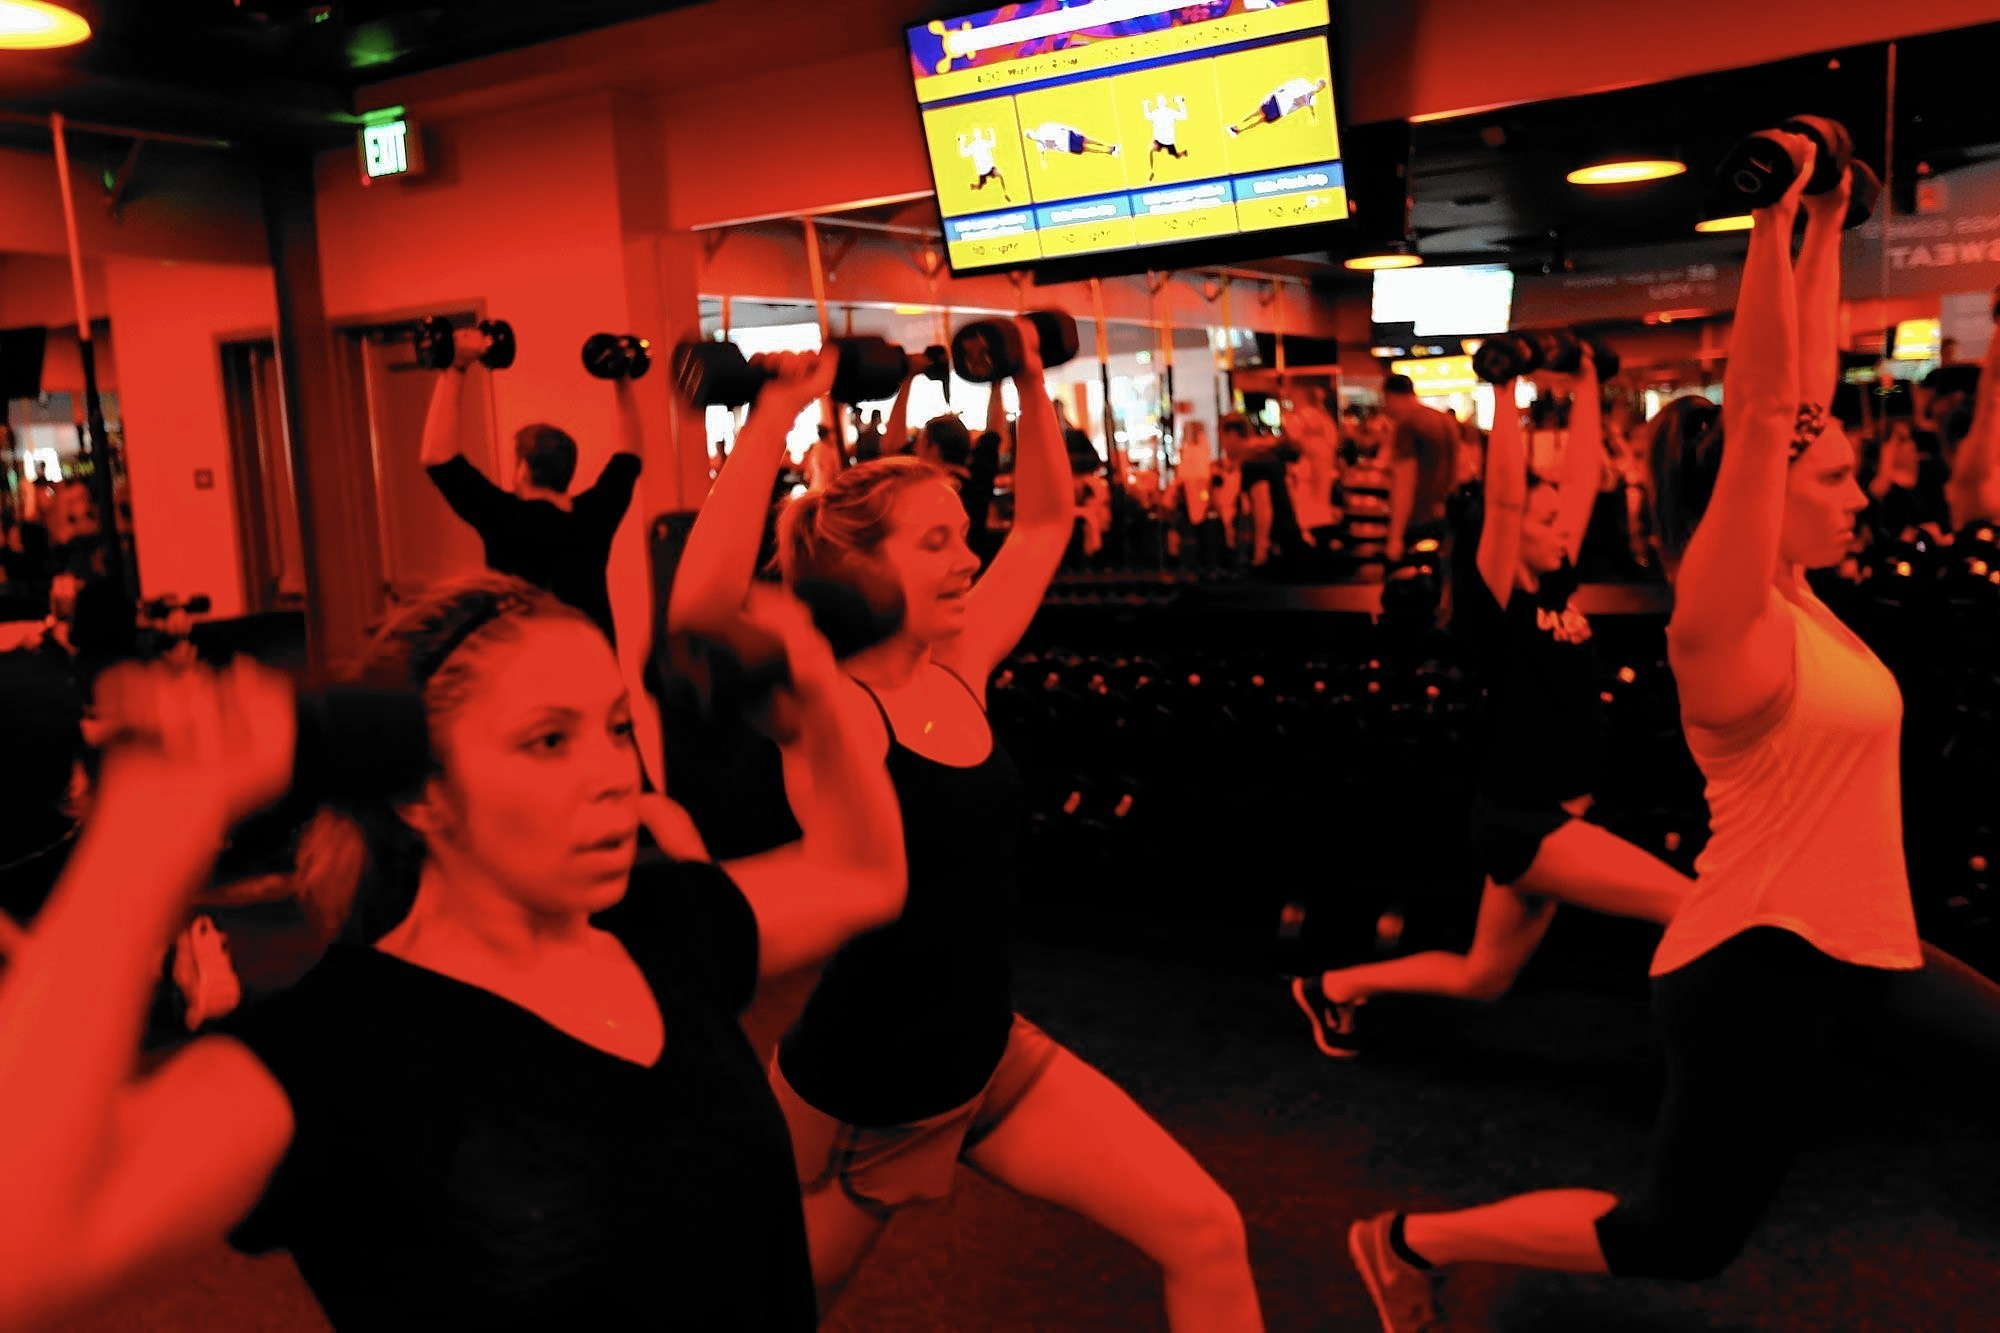 Orangetheory Fitness Aims To Push Exercisers Into The Zone